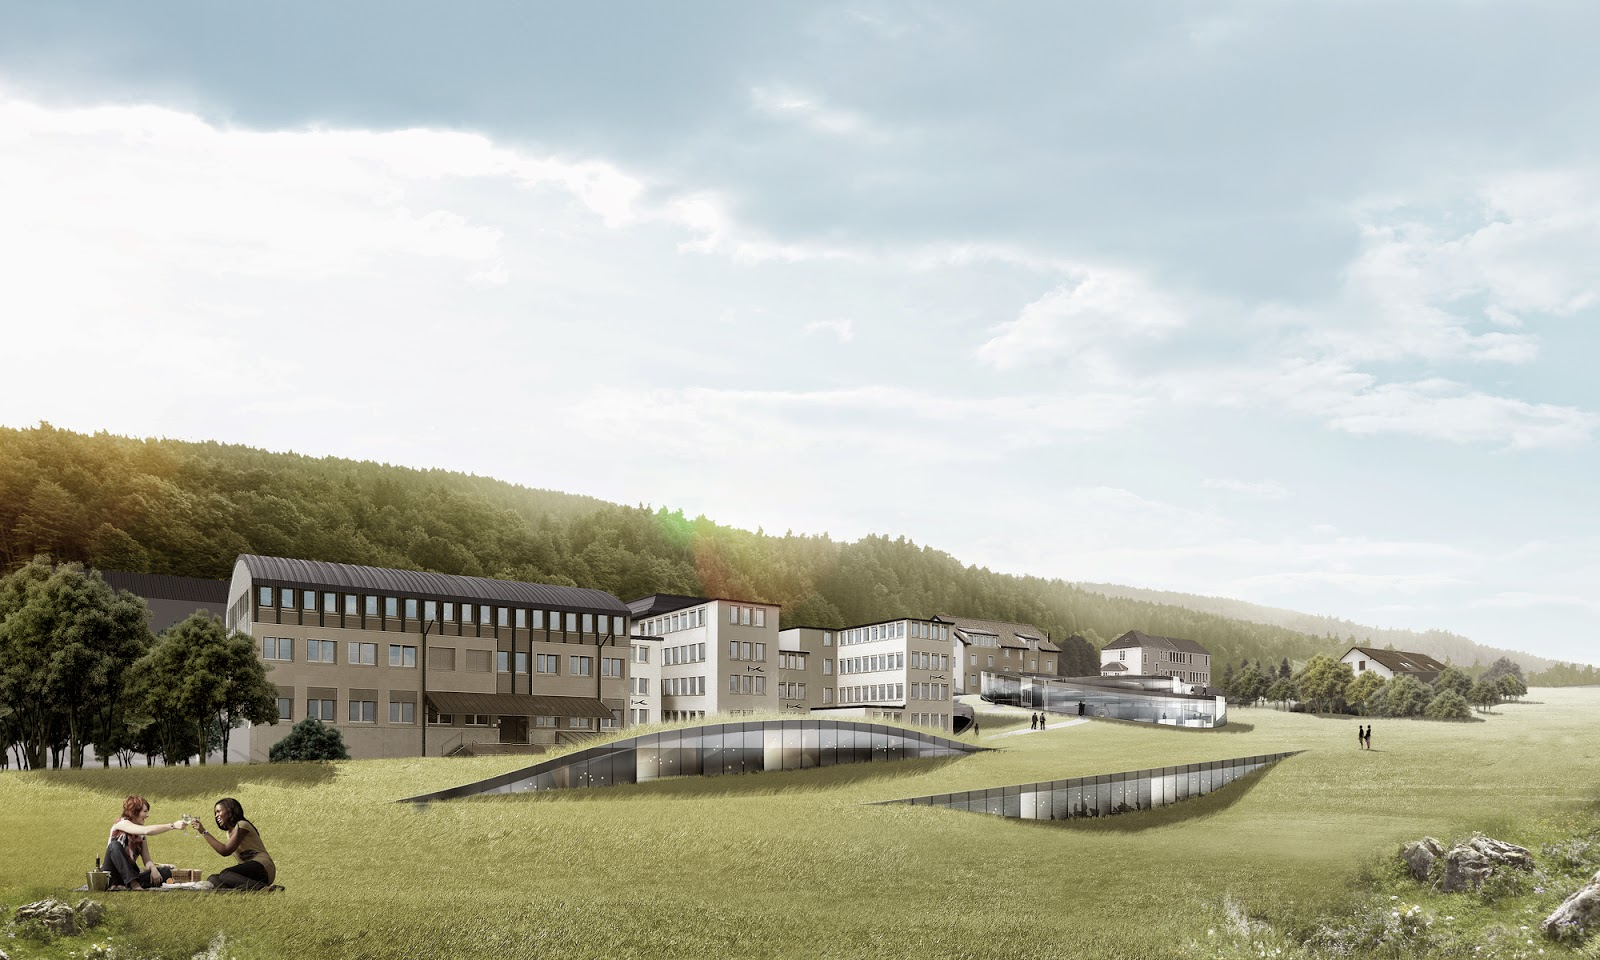 Bảo tàng Audemars Piguet - Big design